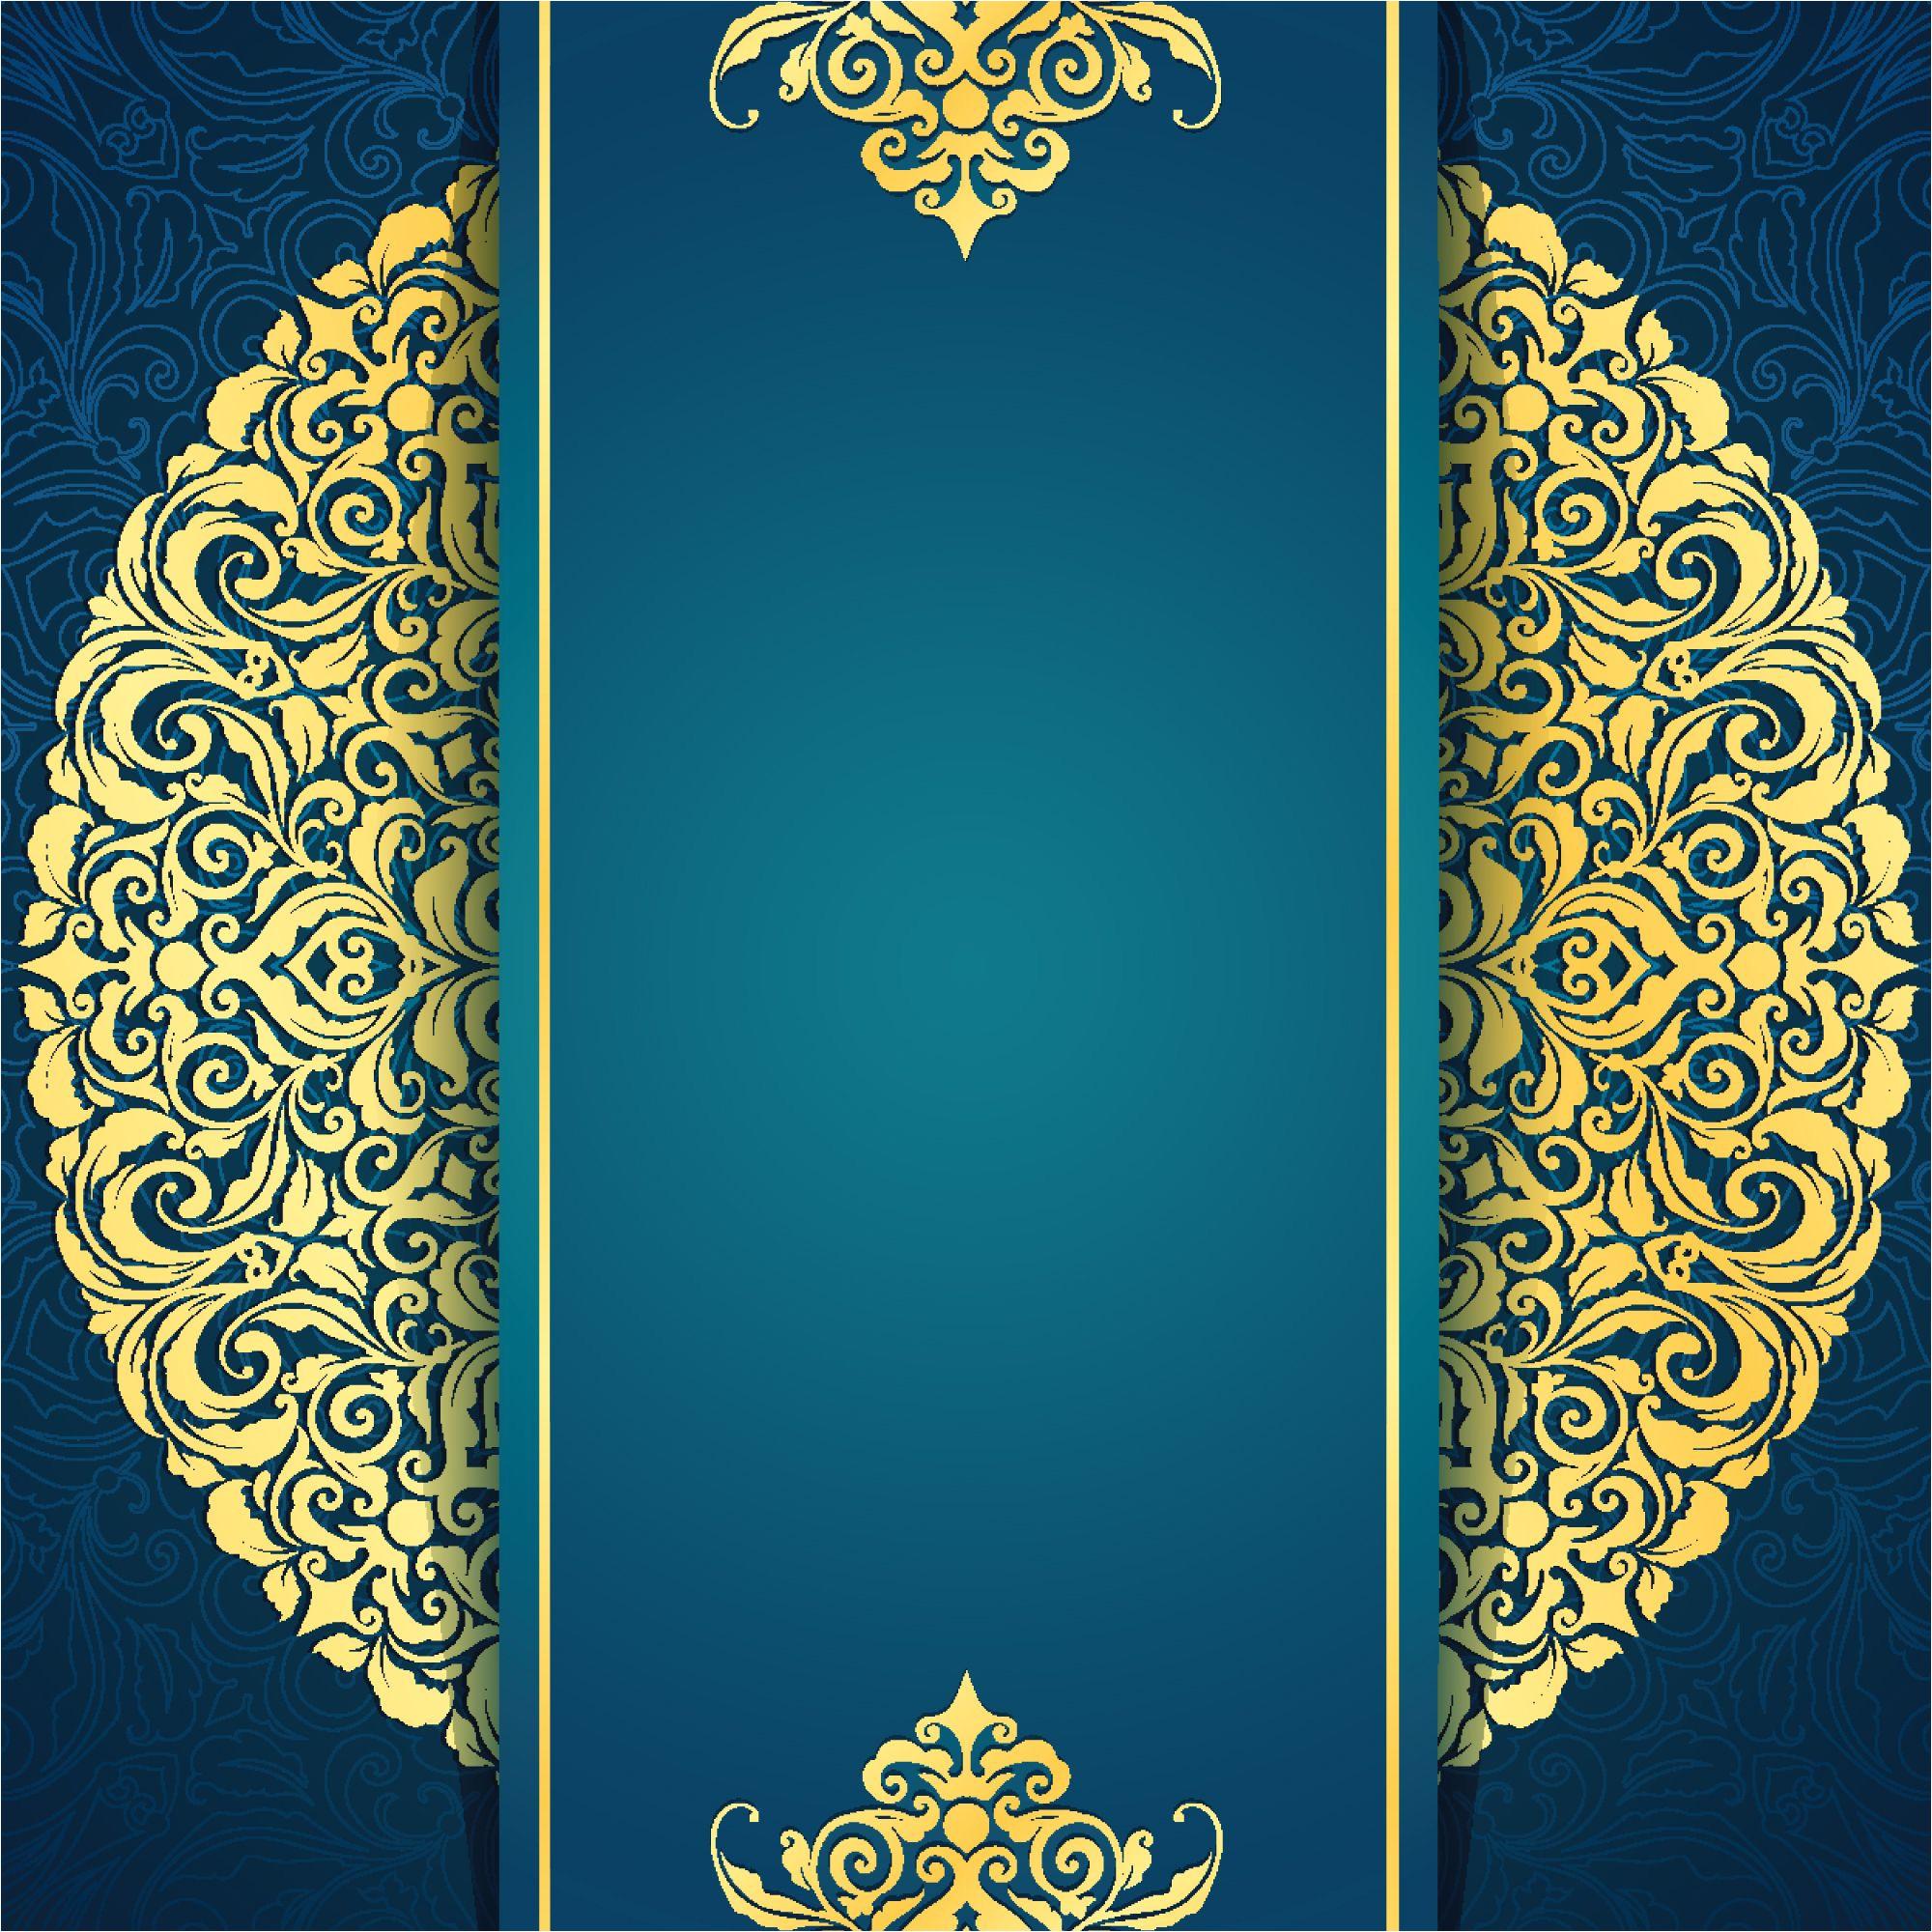 Wedding Card Background Designs Free 14 Elegant Invitation Card Background Images Images with